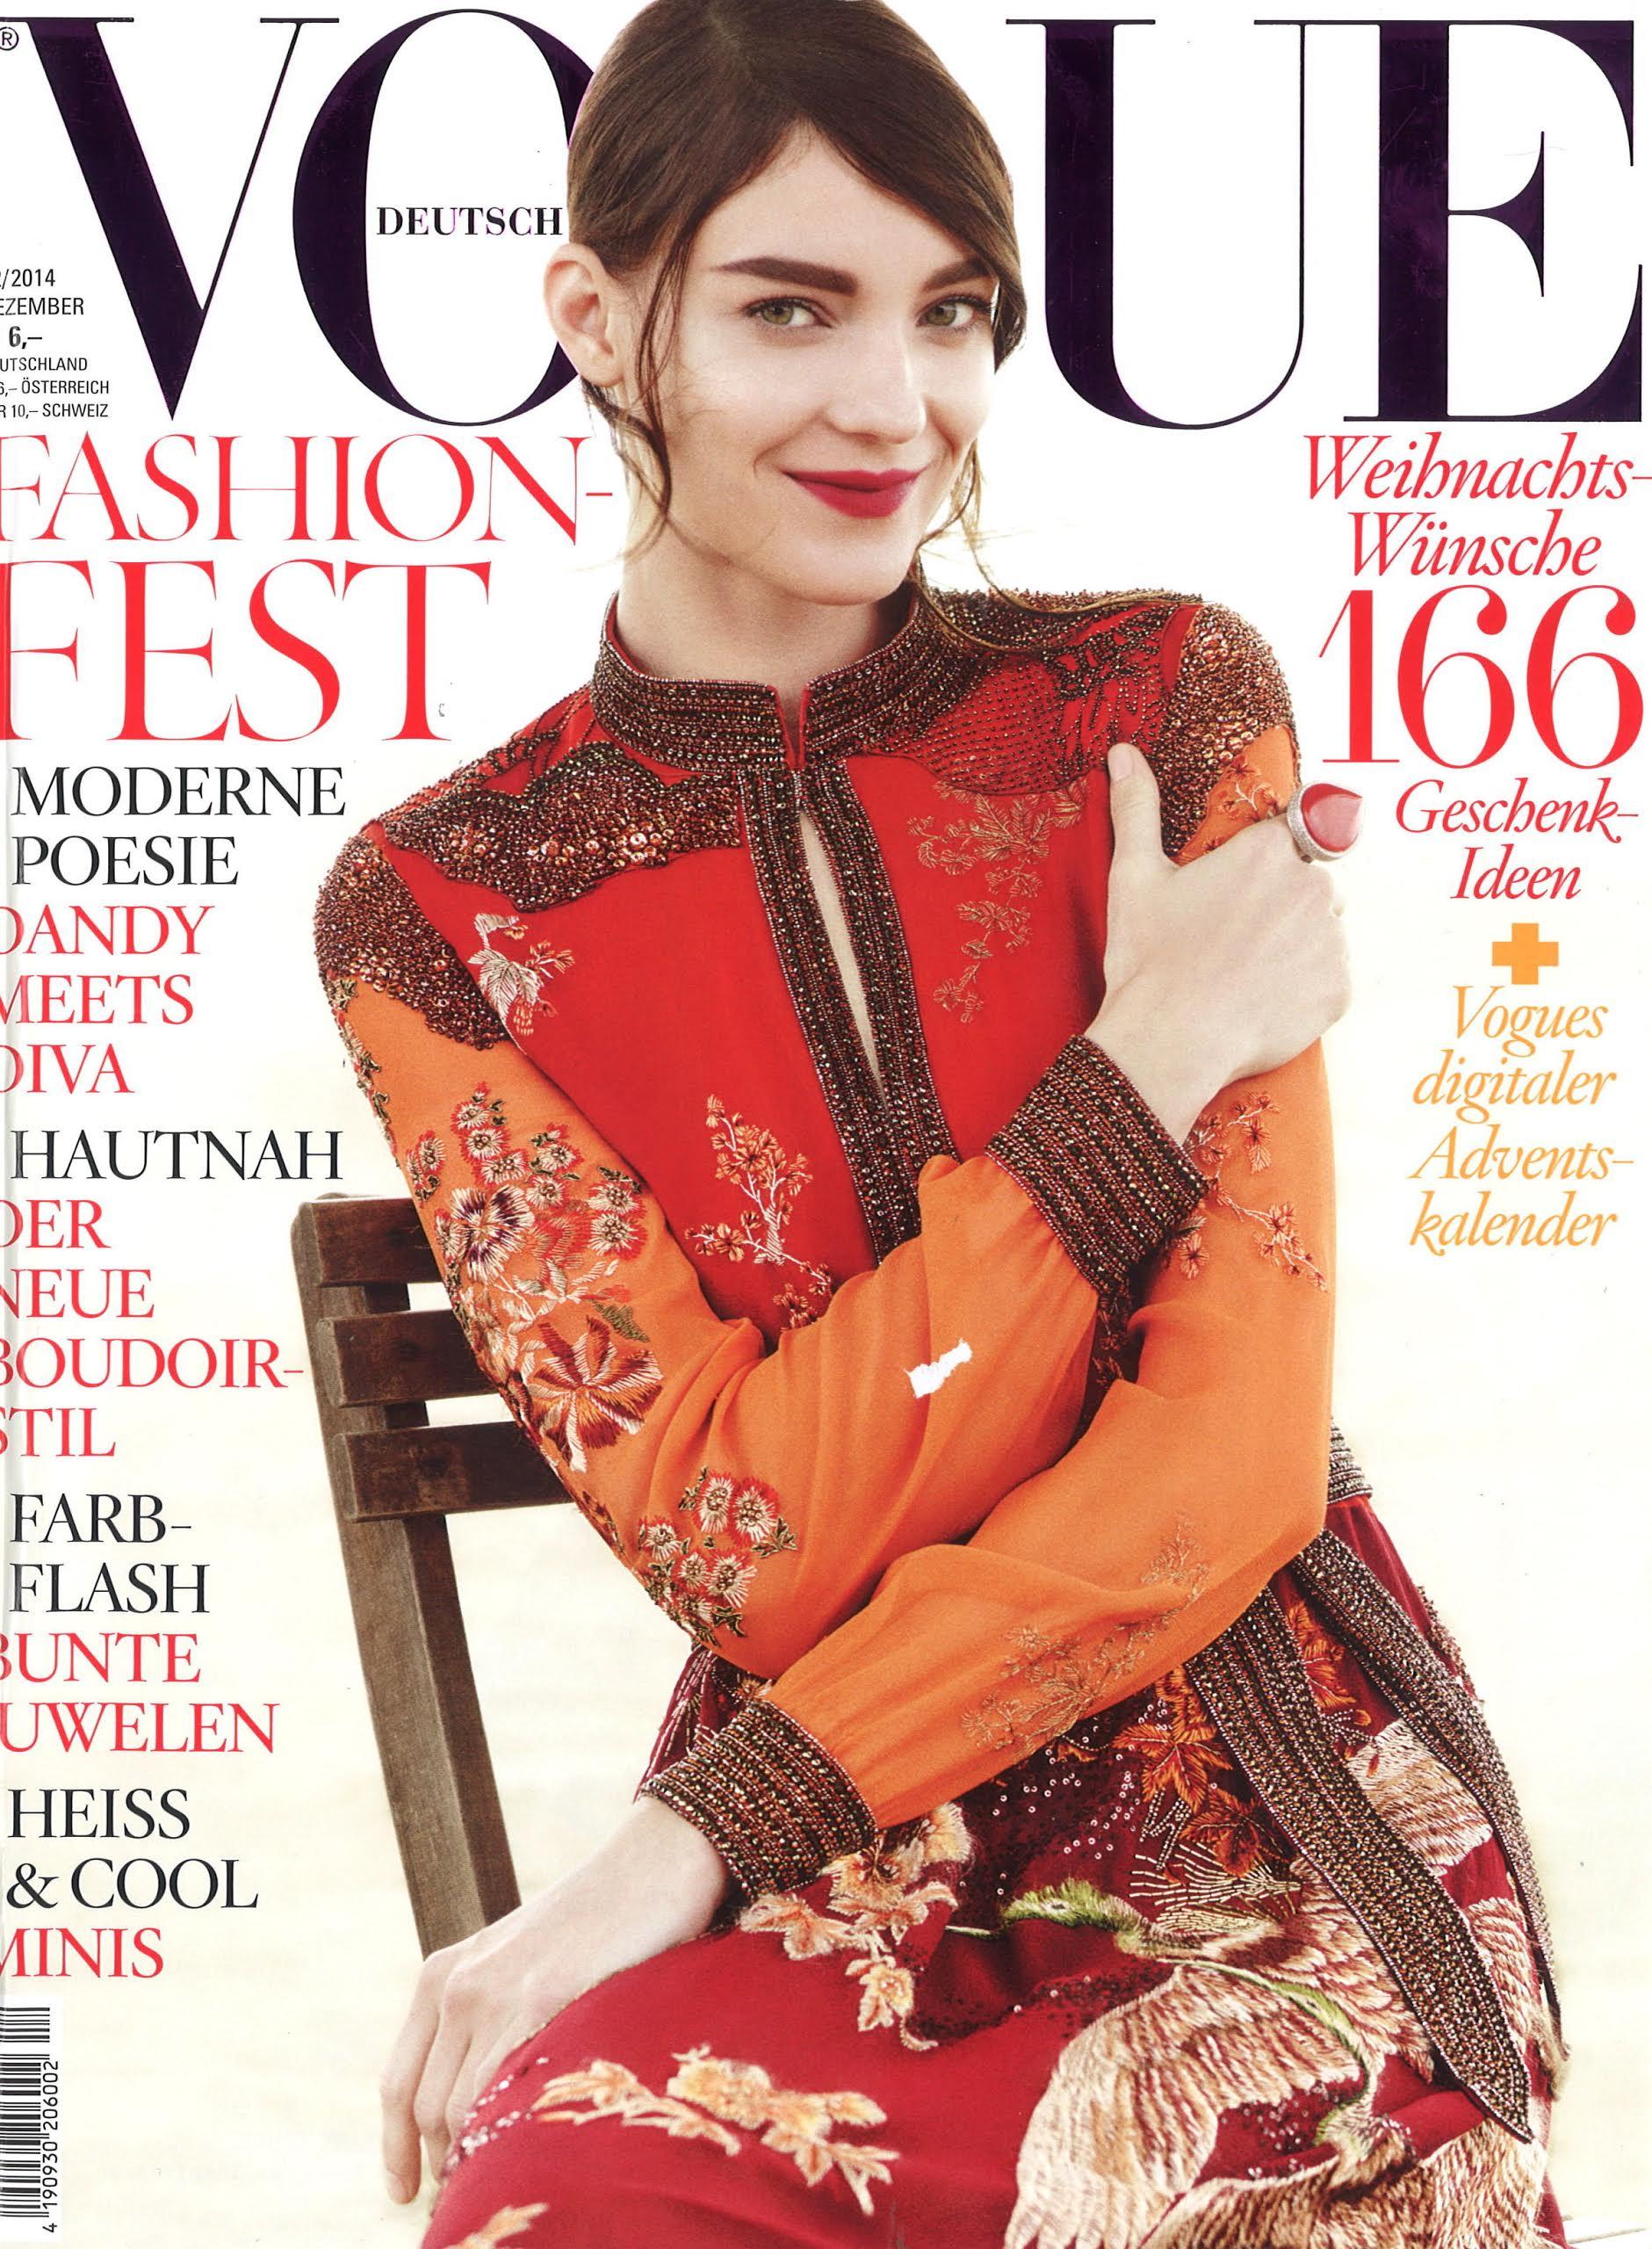 Vogue Germany 2